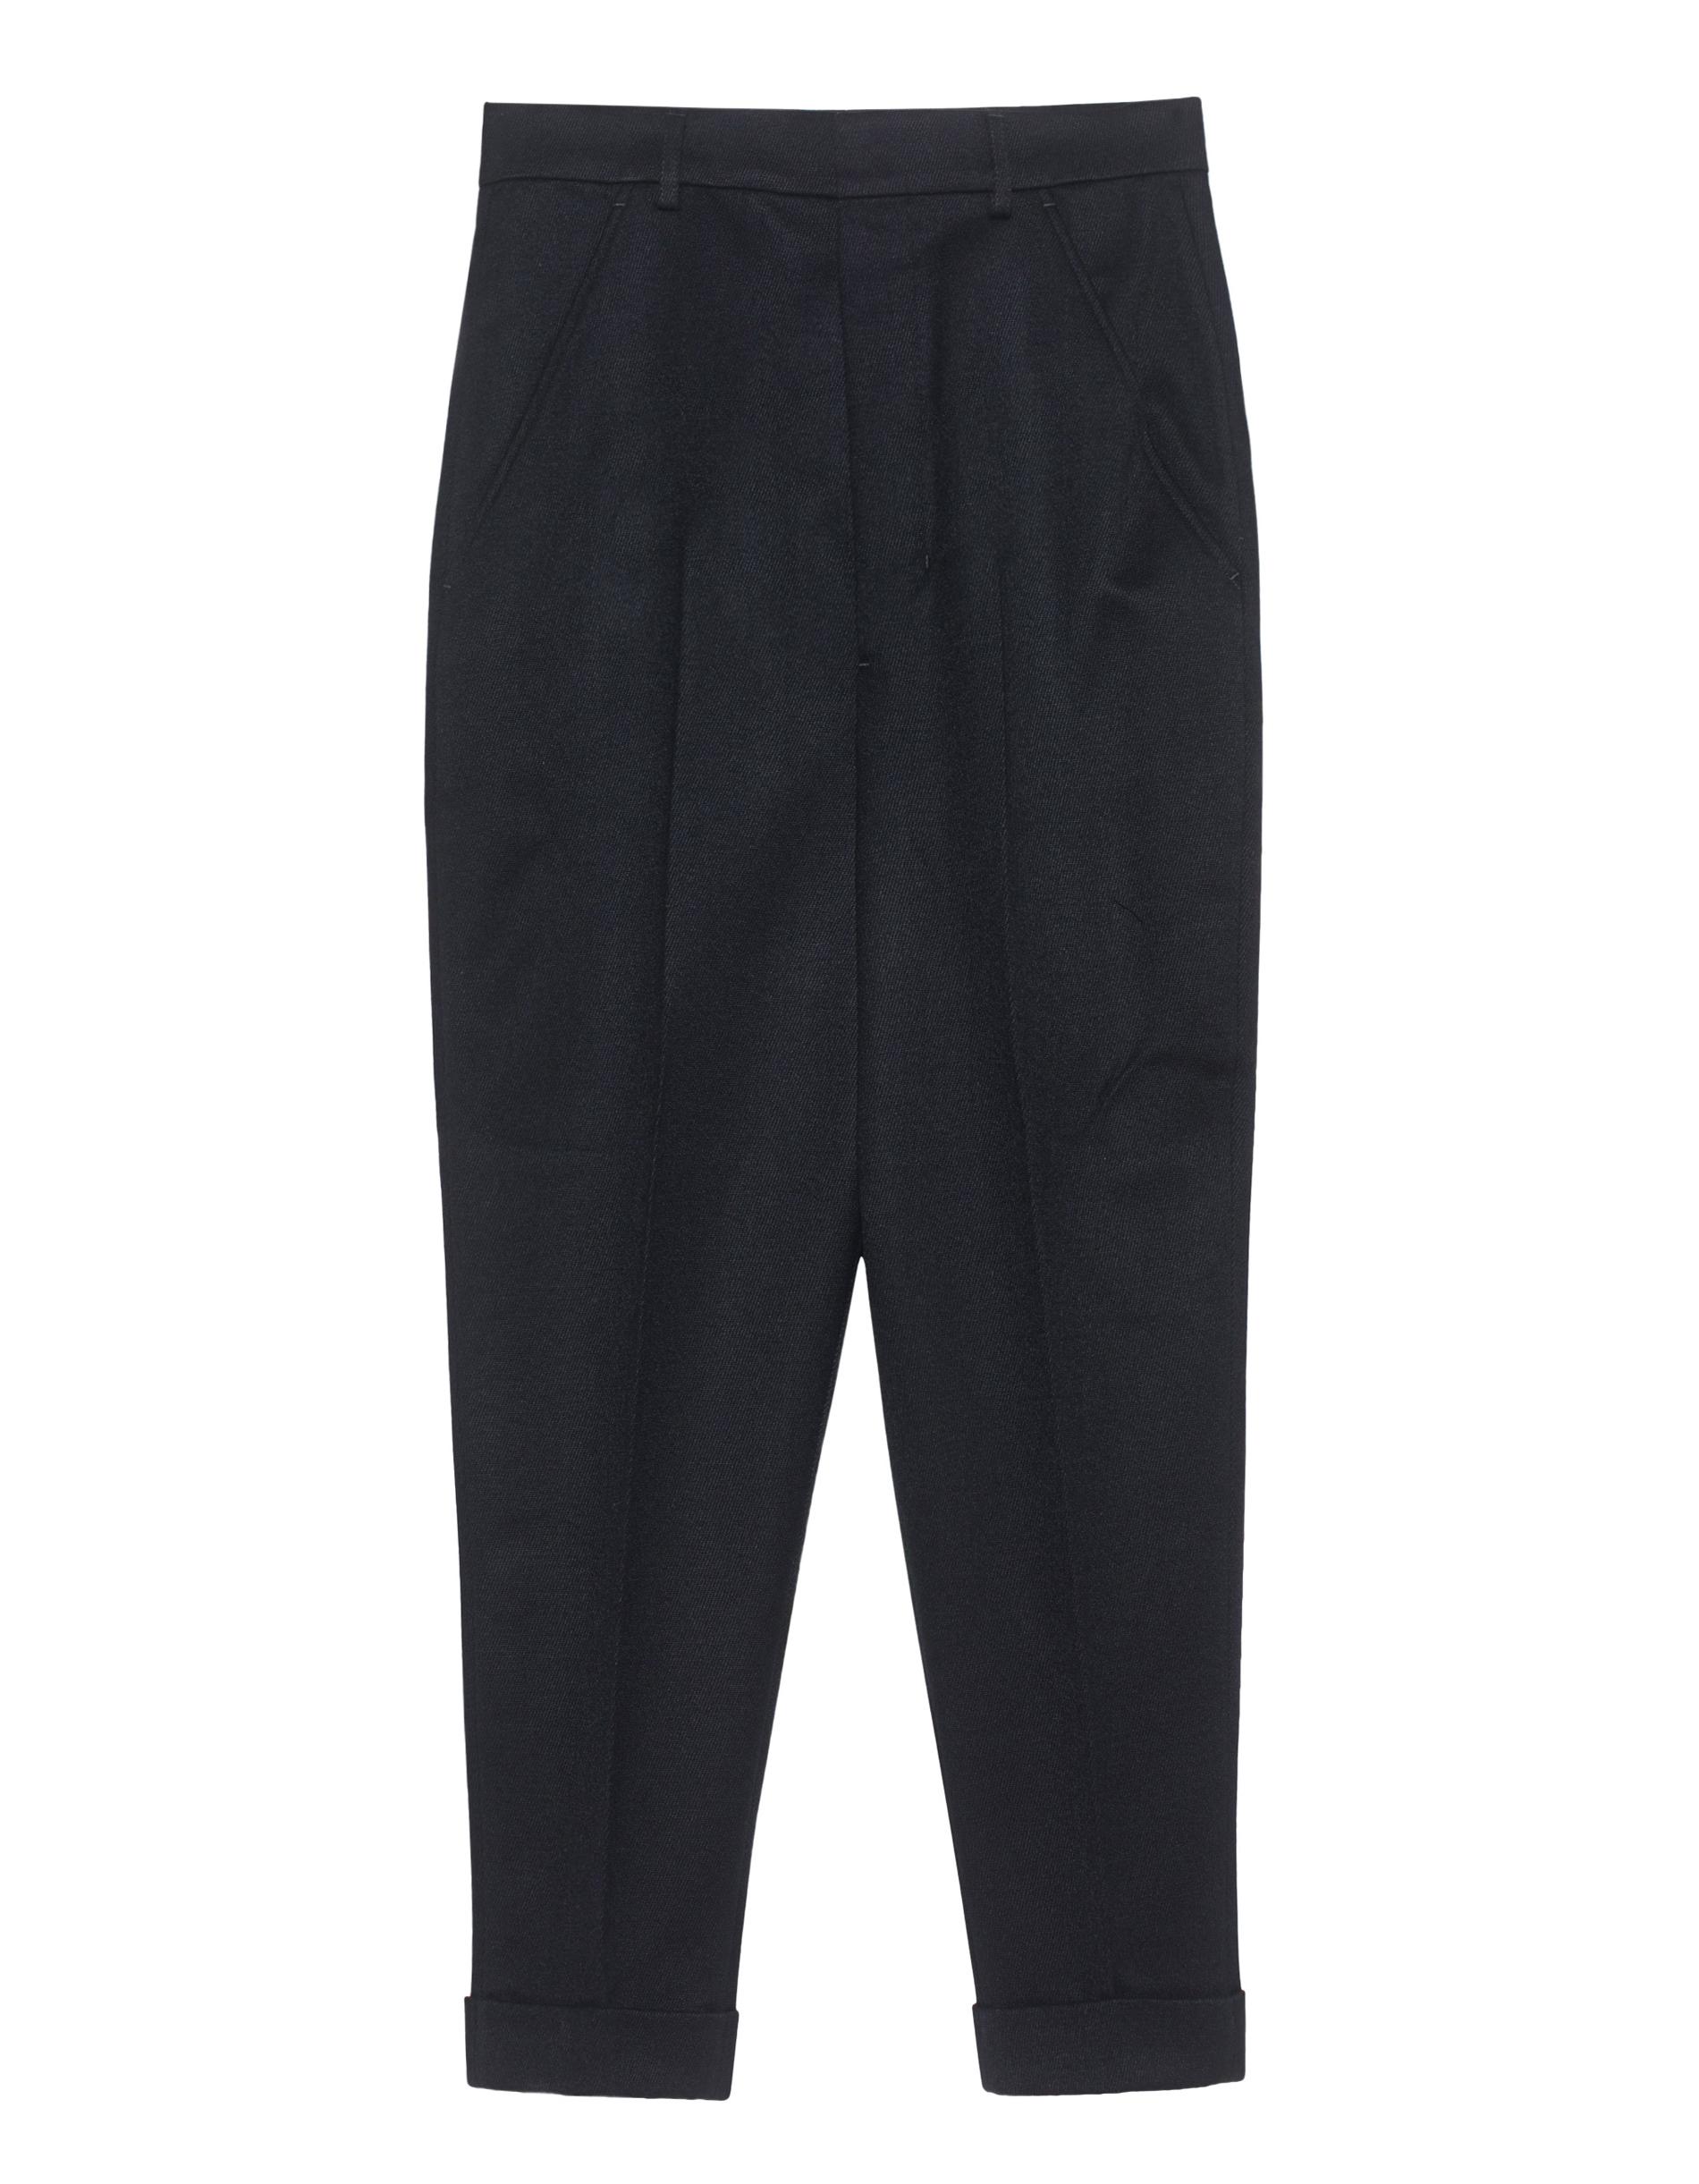 Black Ami Paris trousers AW16